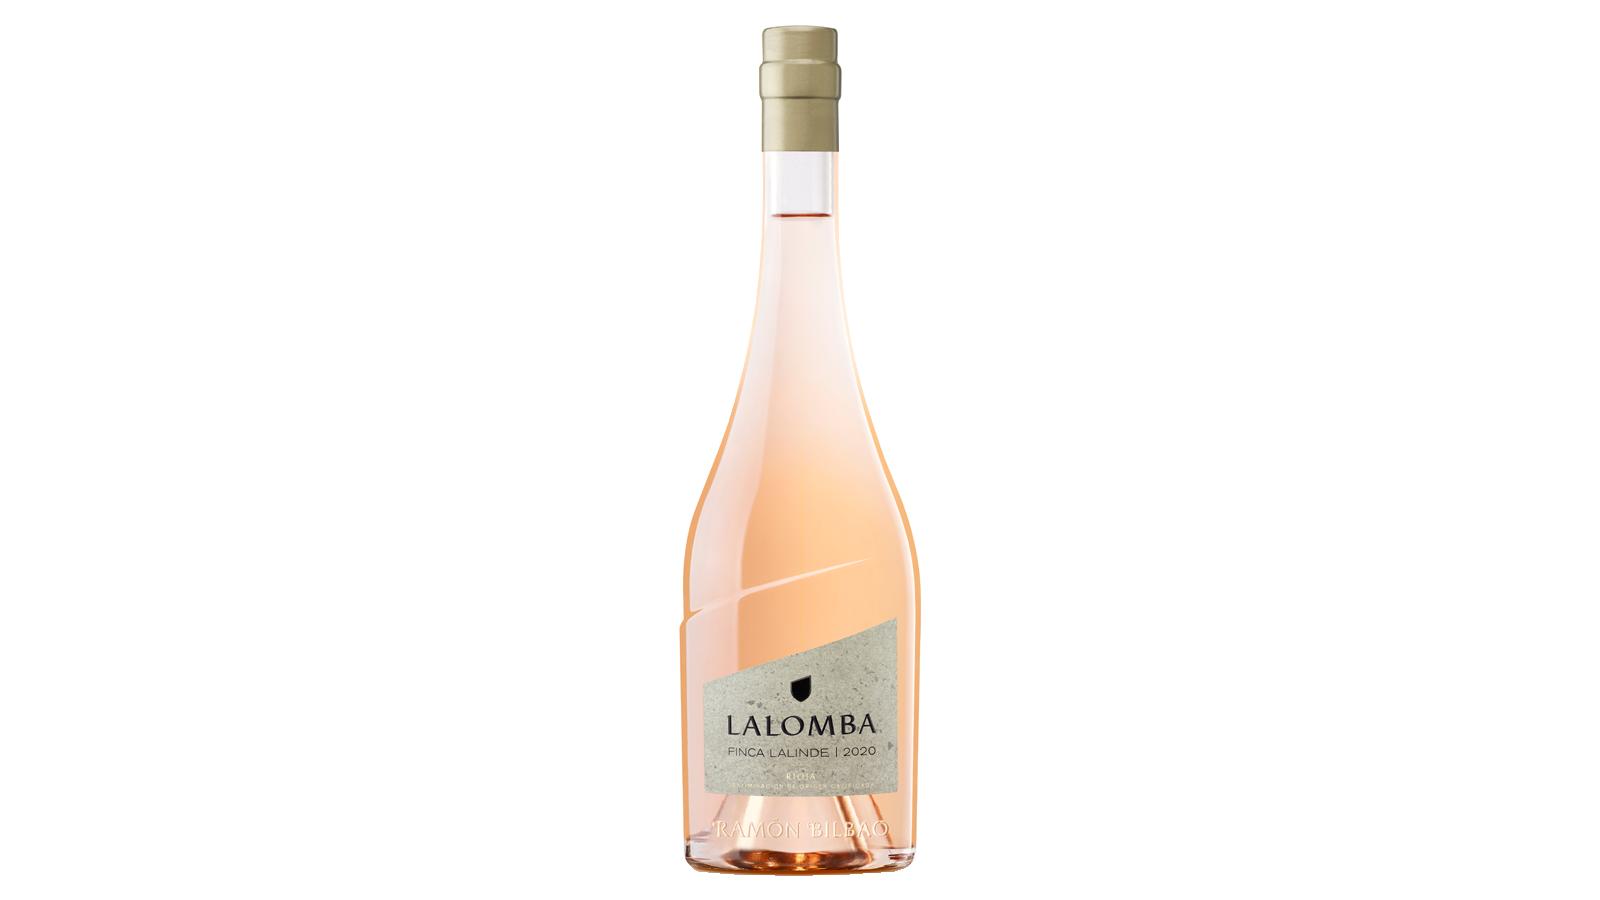 lalomba-lalinde-rosado-2020